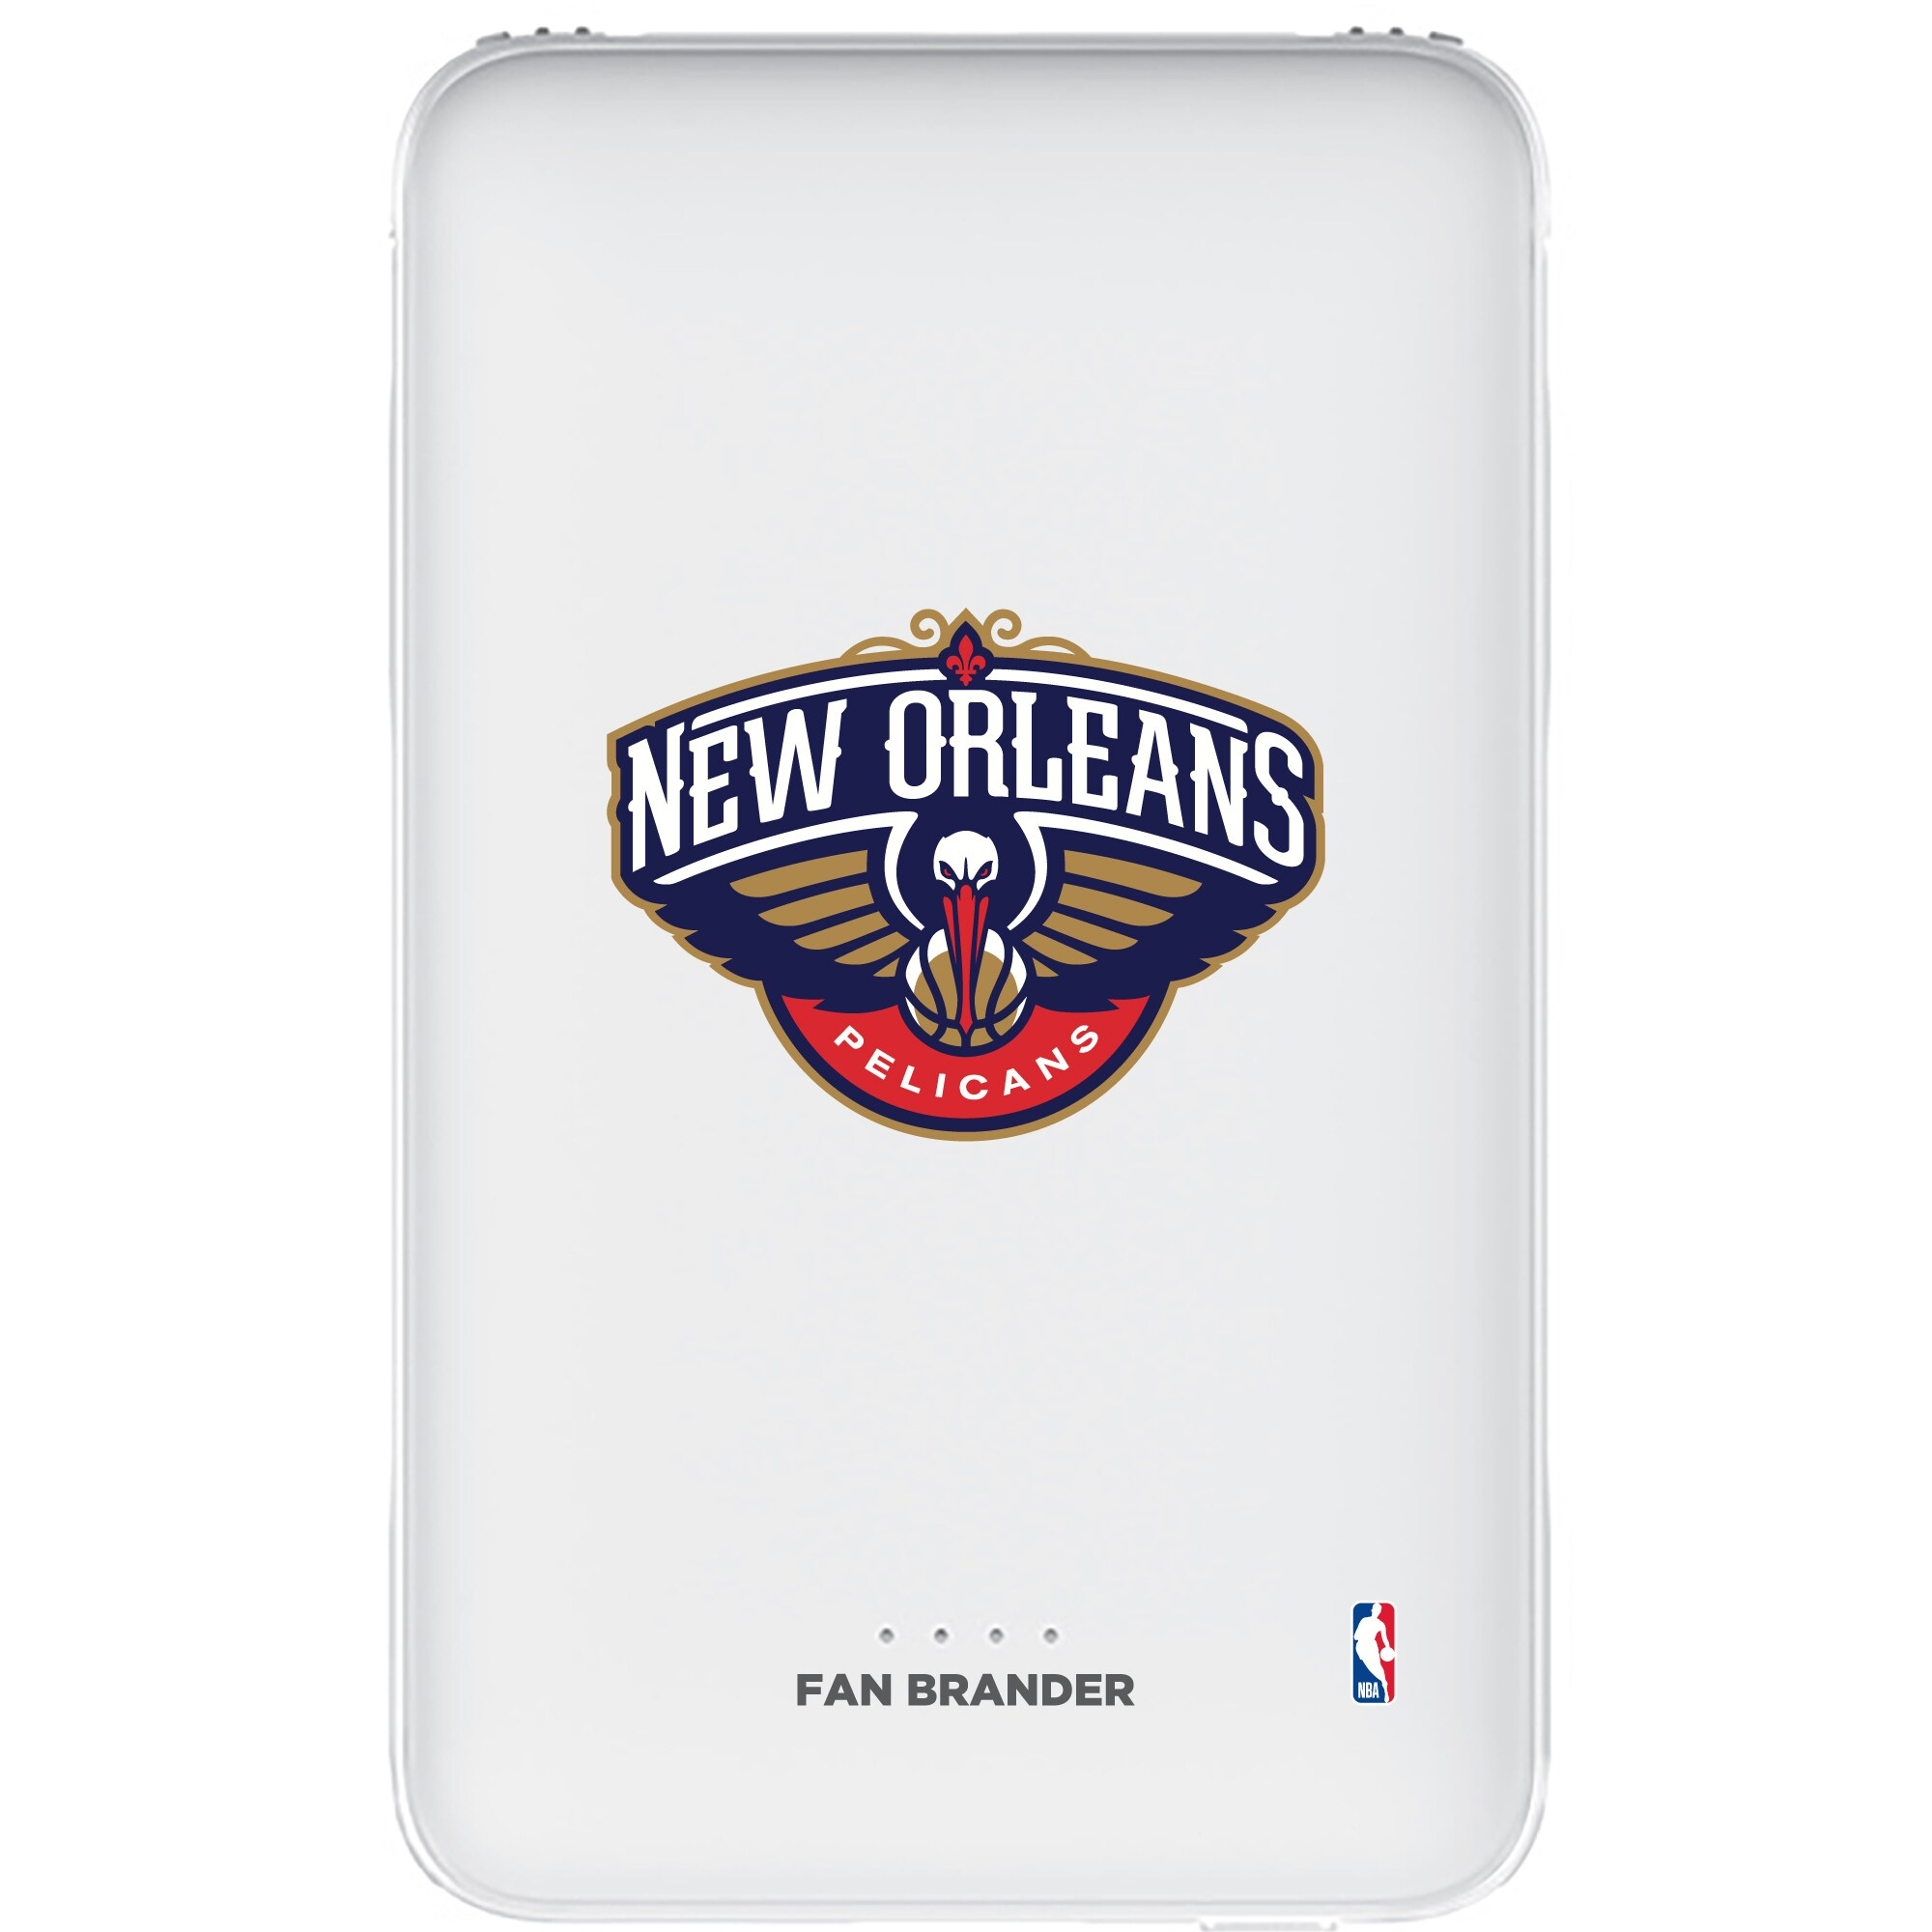 New Orleans Pelicans 5000mAh Portable Power Bank - White